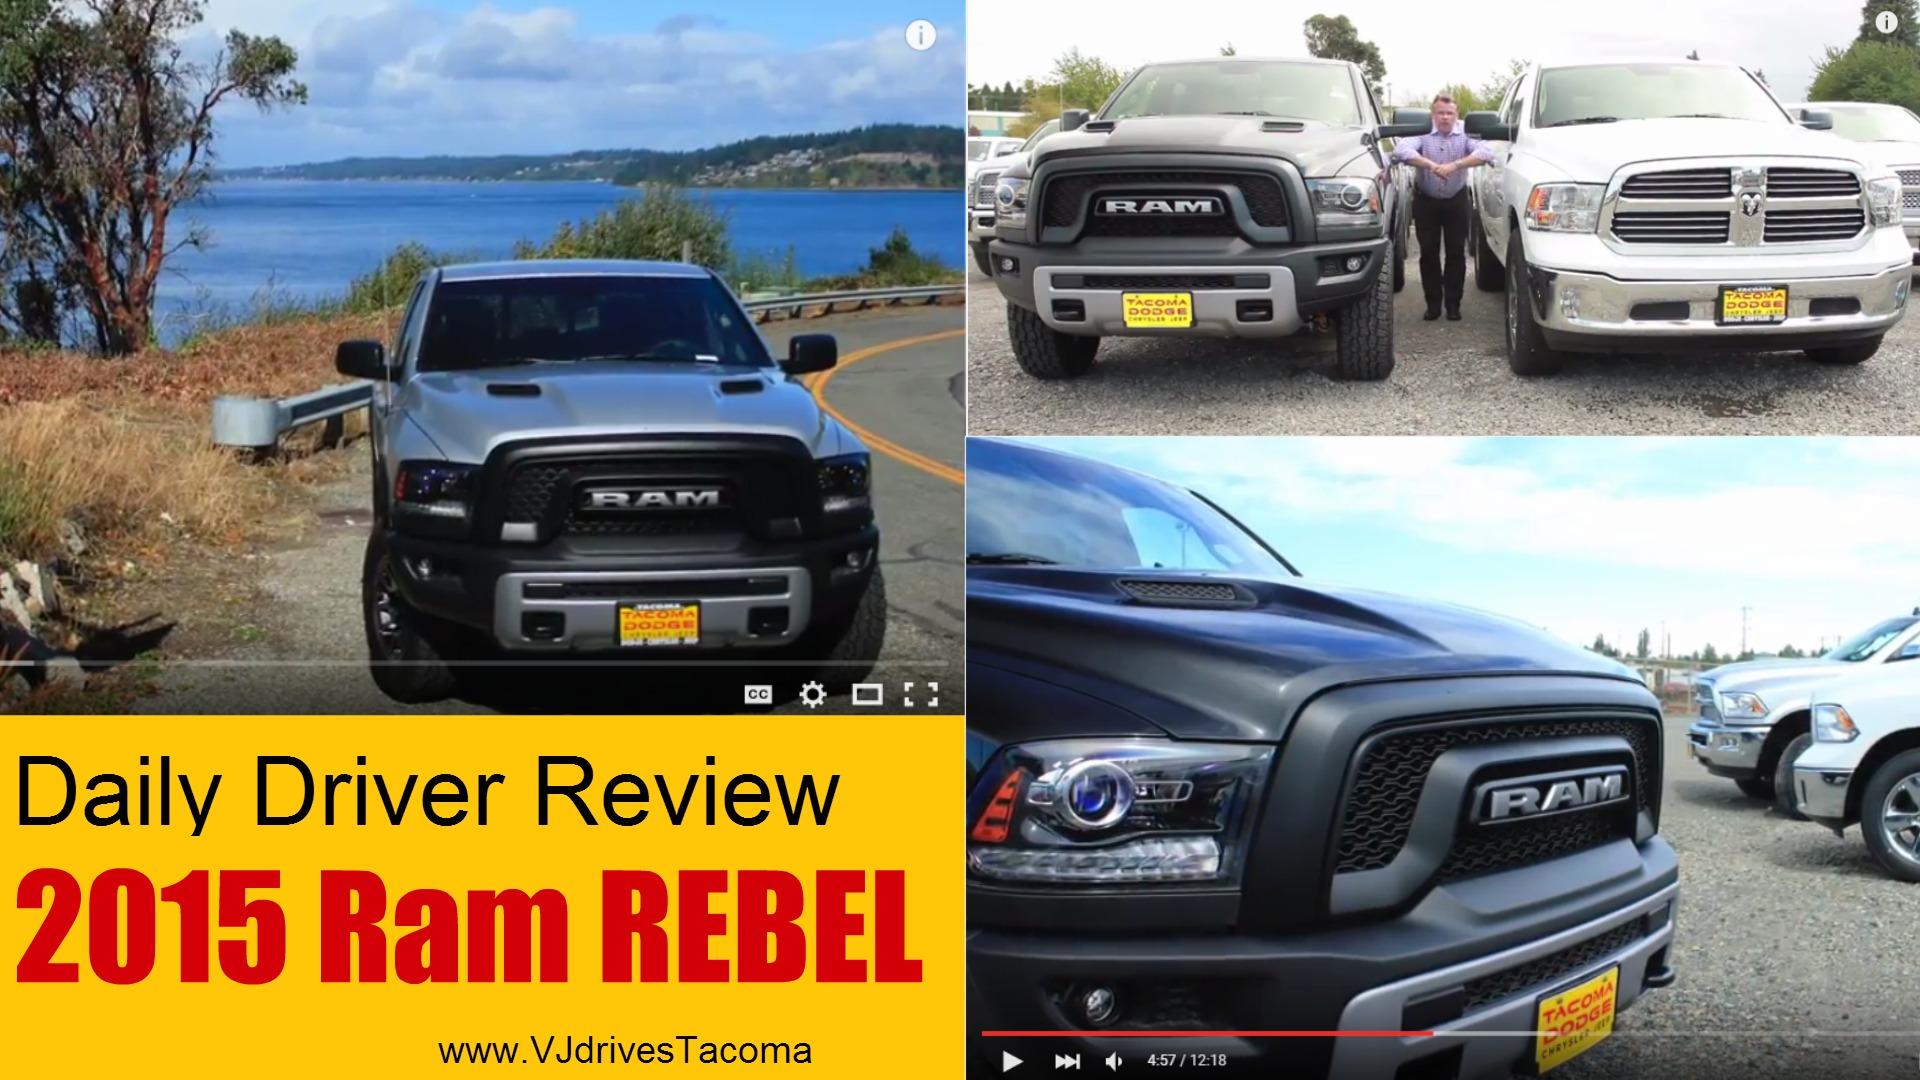 The Ram Rebel Pickup Won T Disappoint Tacoma Drivers Vj Drives Tacoma